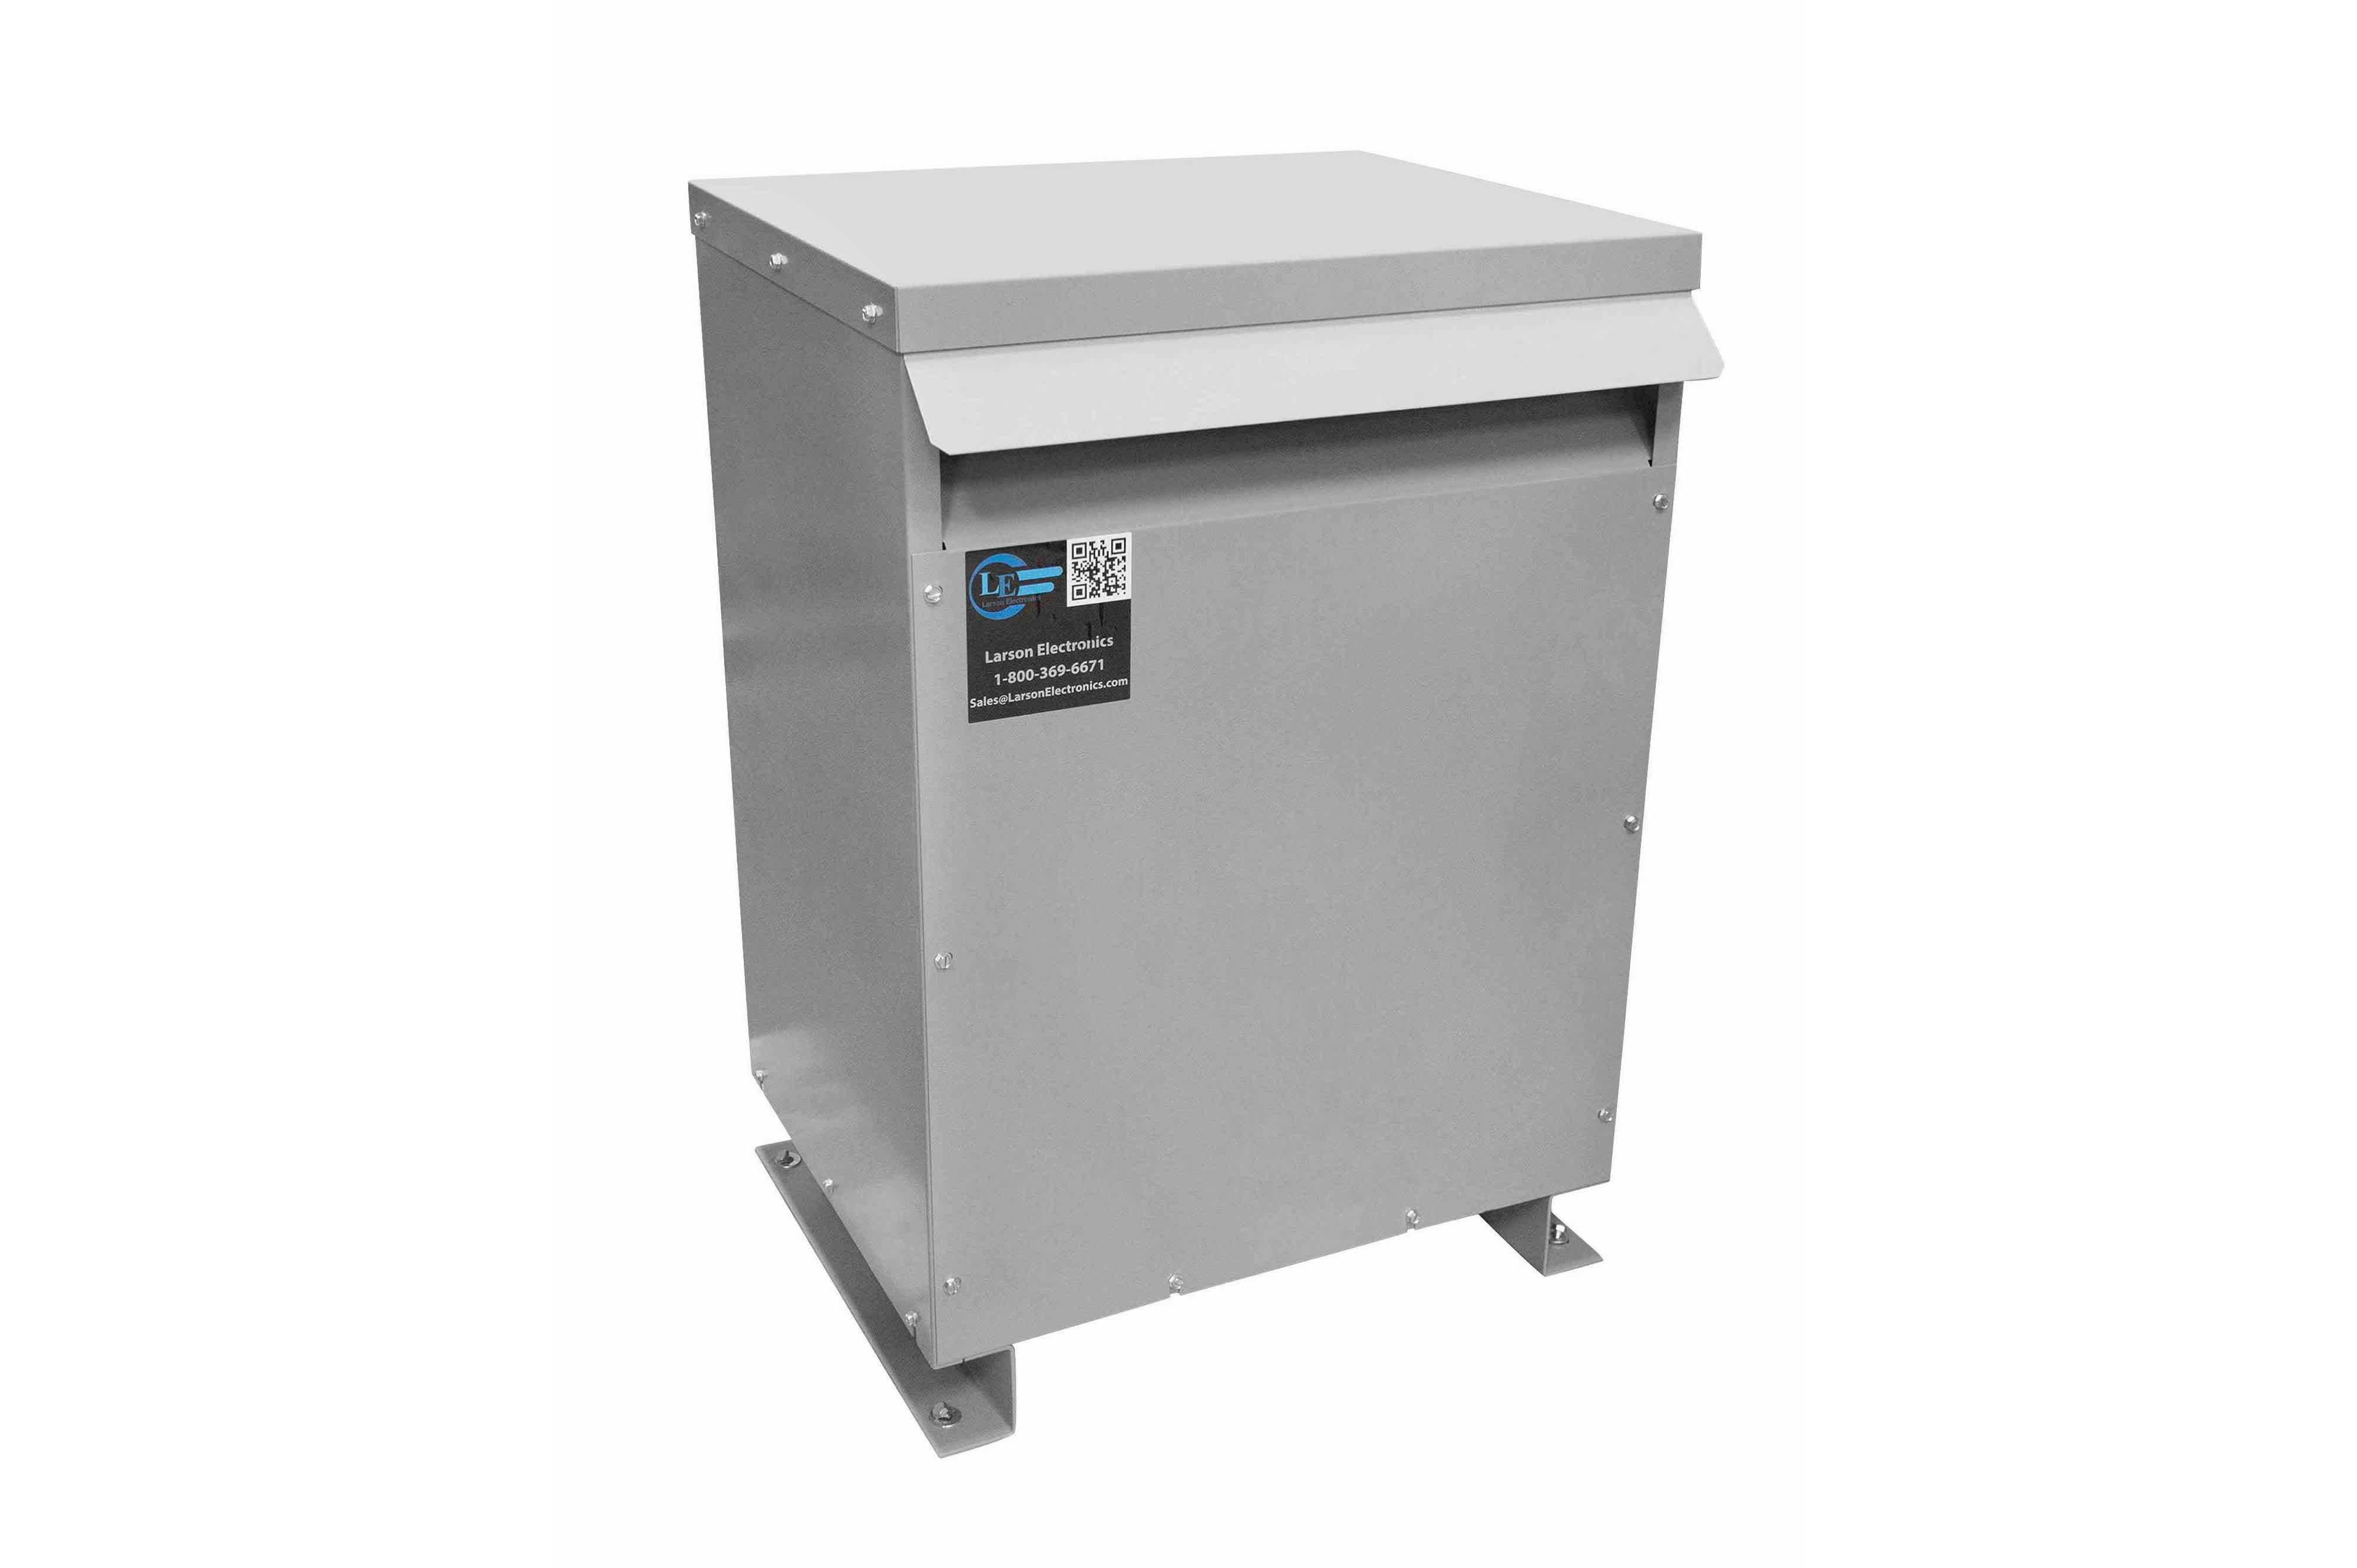 26 kVA 3PH Isolation Transformer, 240V Wye Primary, 480V Delta Secondary, N3R, Ventilated, 60 Hz